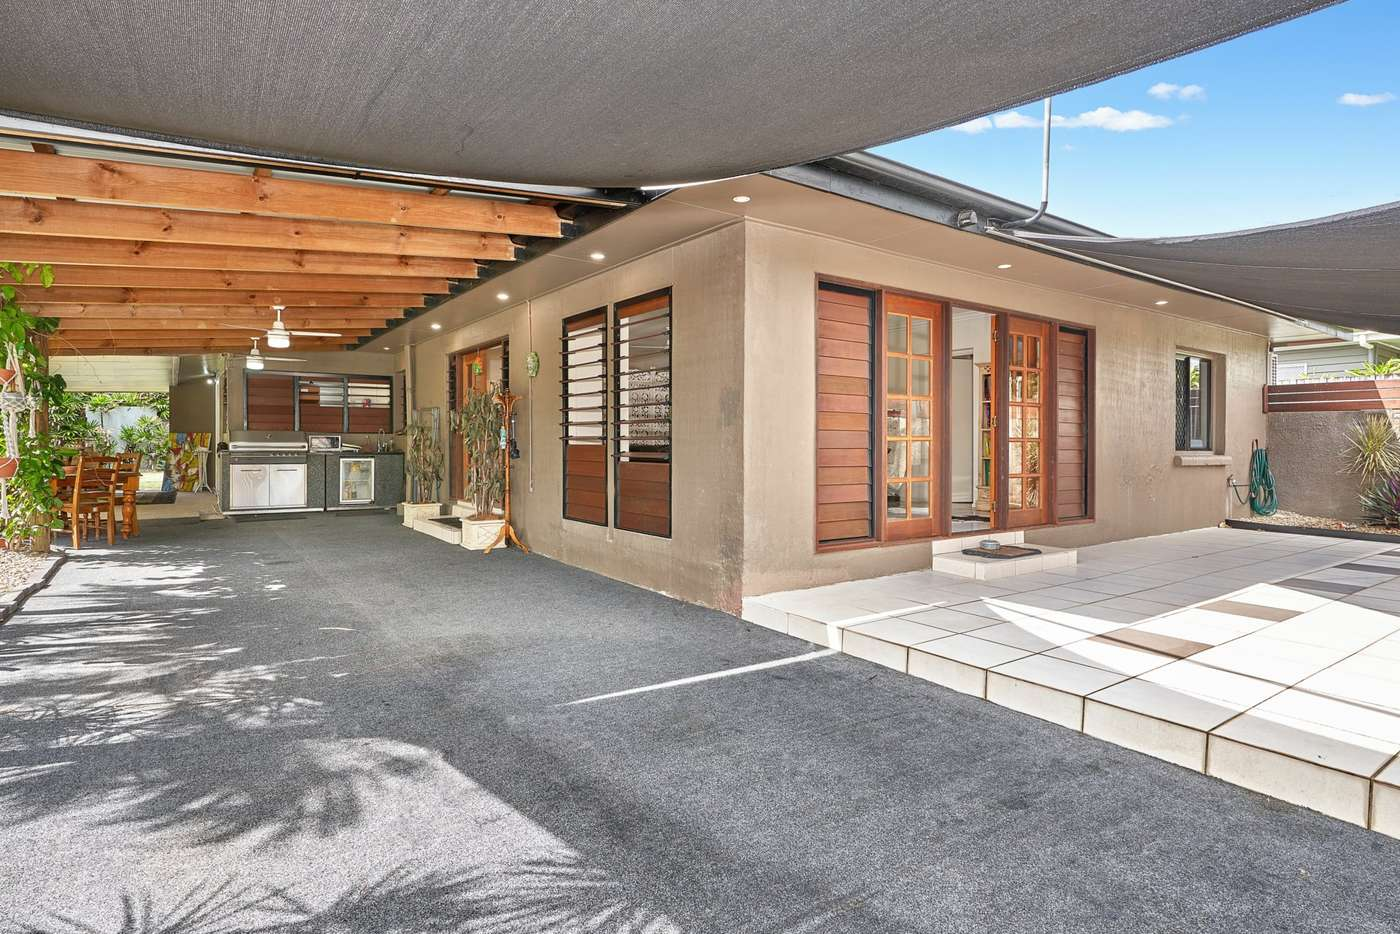 Main view of Homely semiDetached listing, 1/84 Mayers Street, Manunda QLD 4870